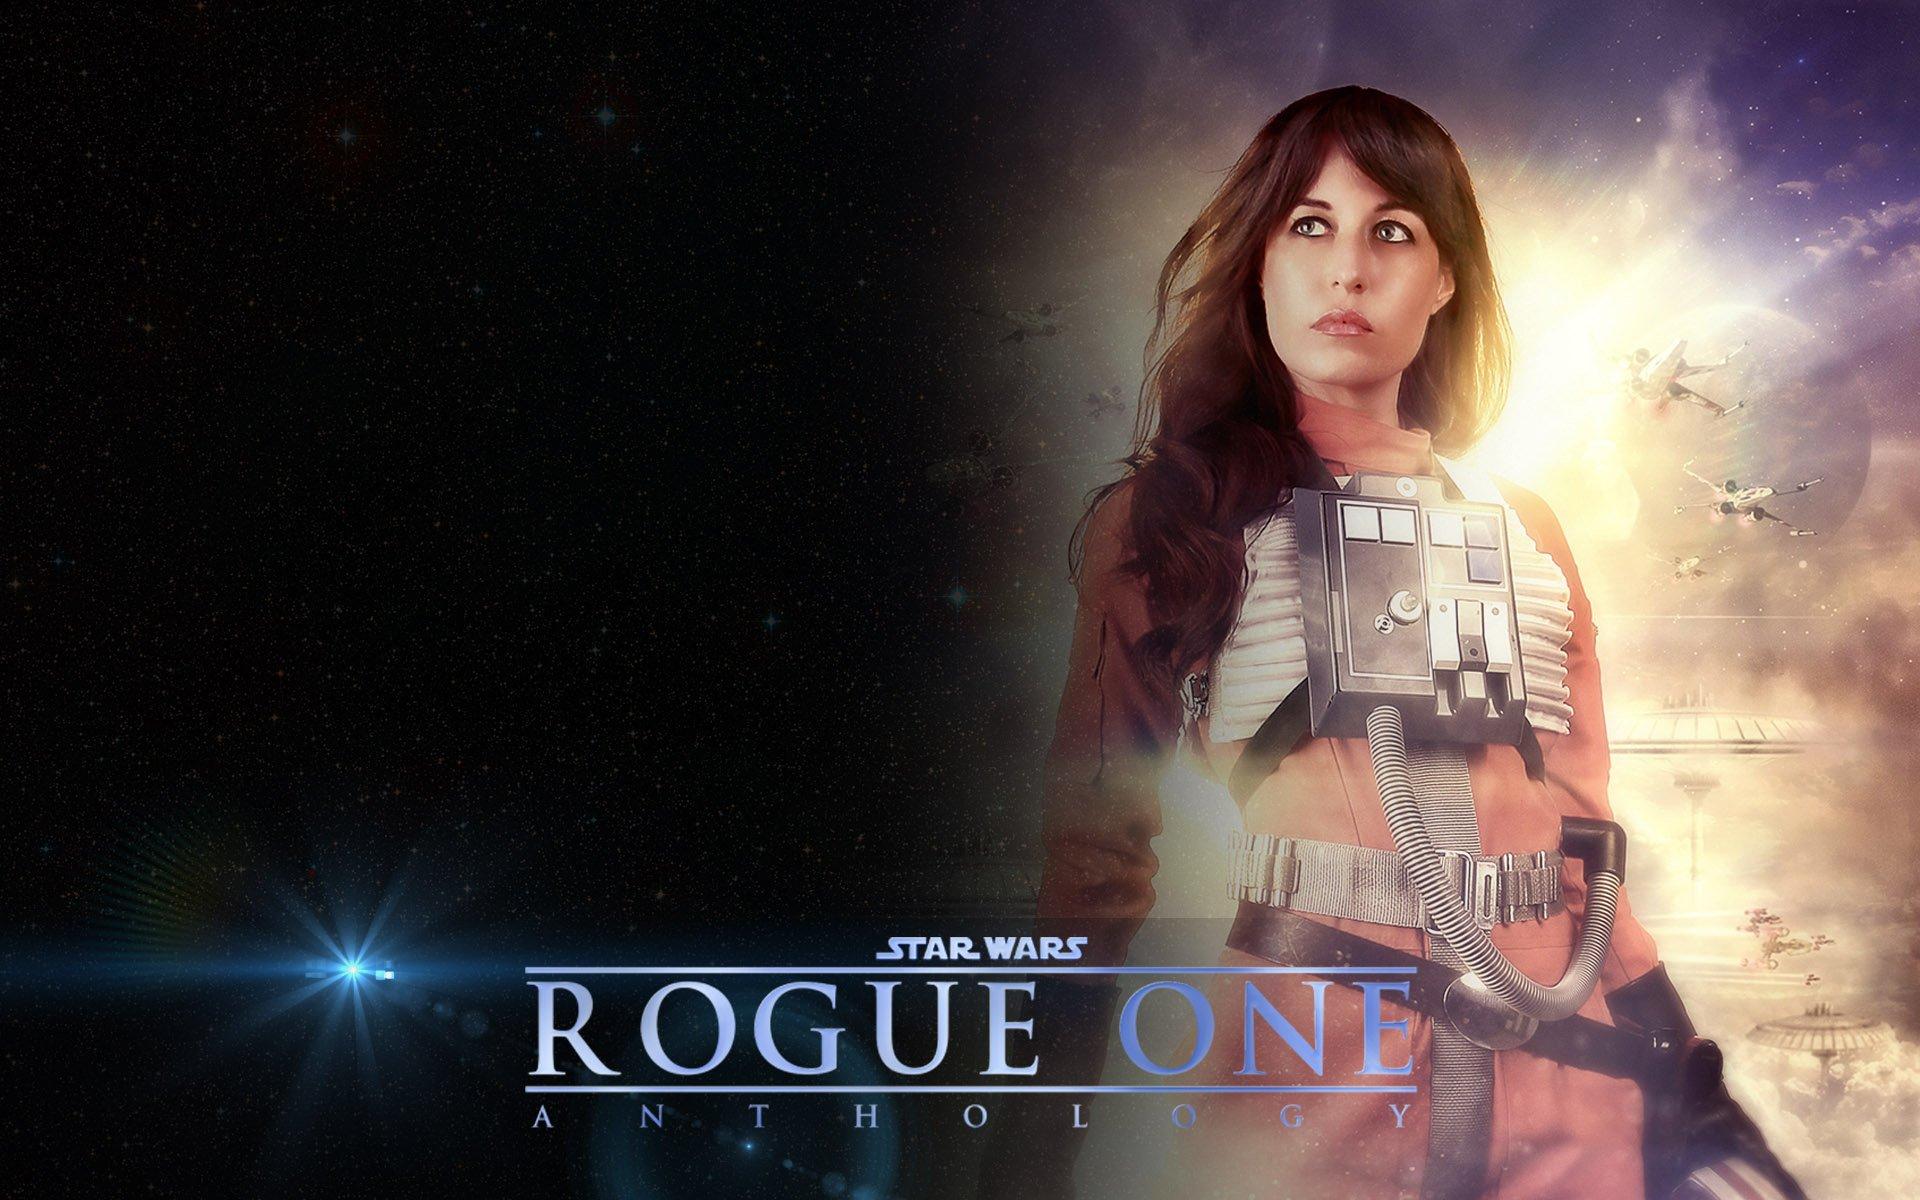 Star Wars Rogue One Wallpaper: ROGUE ONE Star Wars Story Disney Futuristic Sci-fi Opera